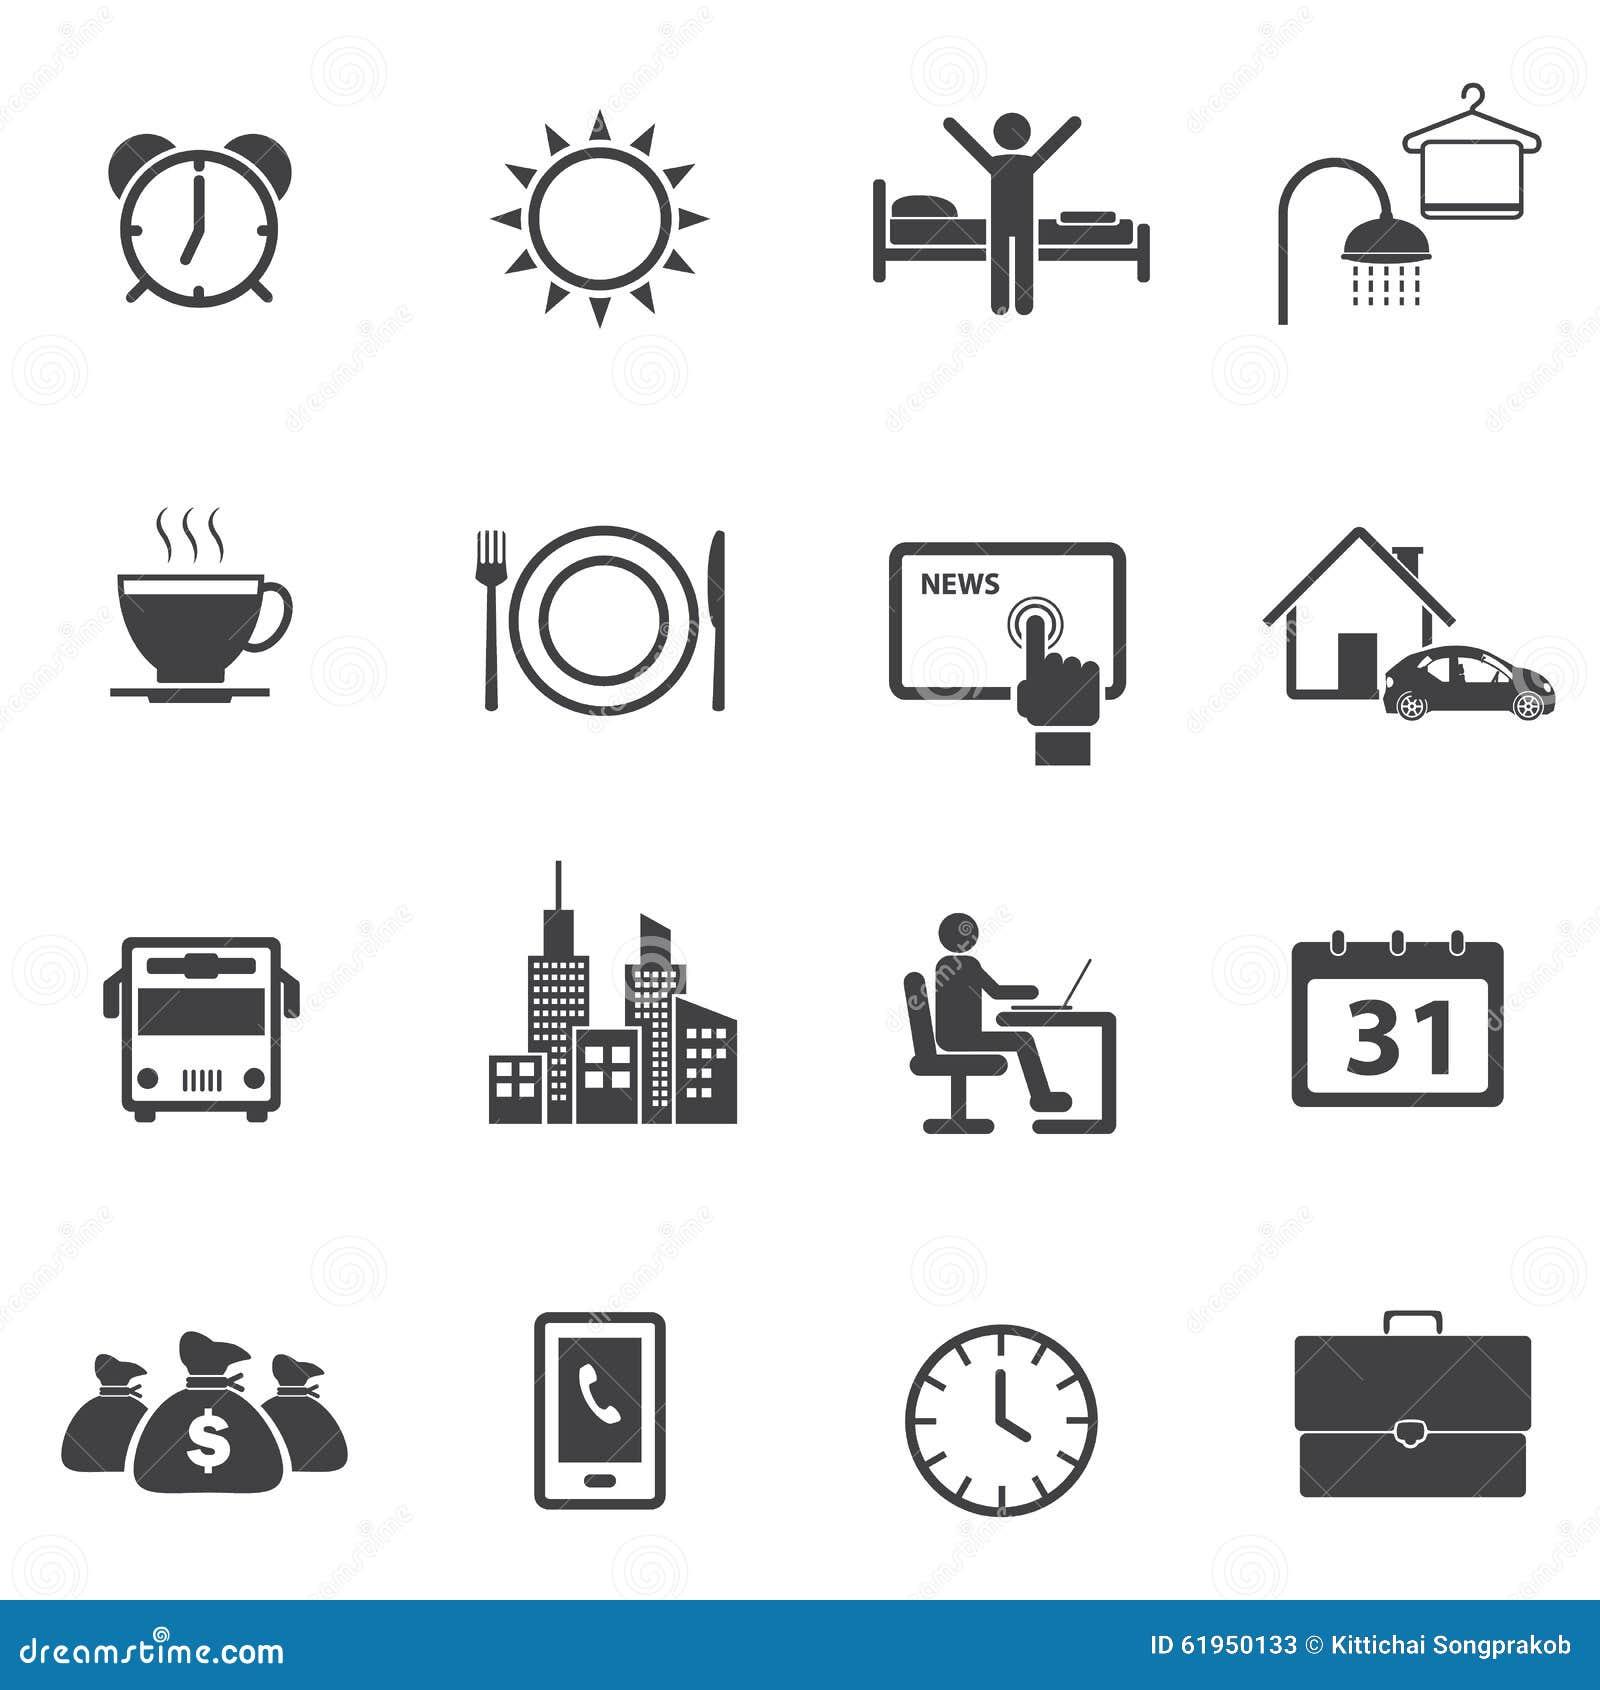 Activity Daily Routine Icons Set Stock Photo Image 61950133